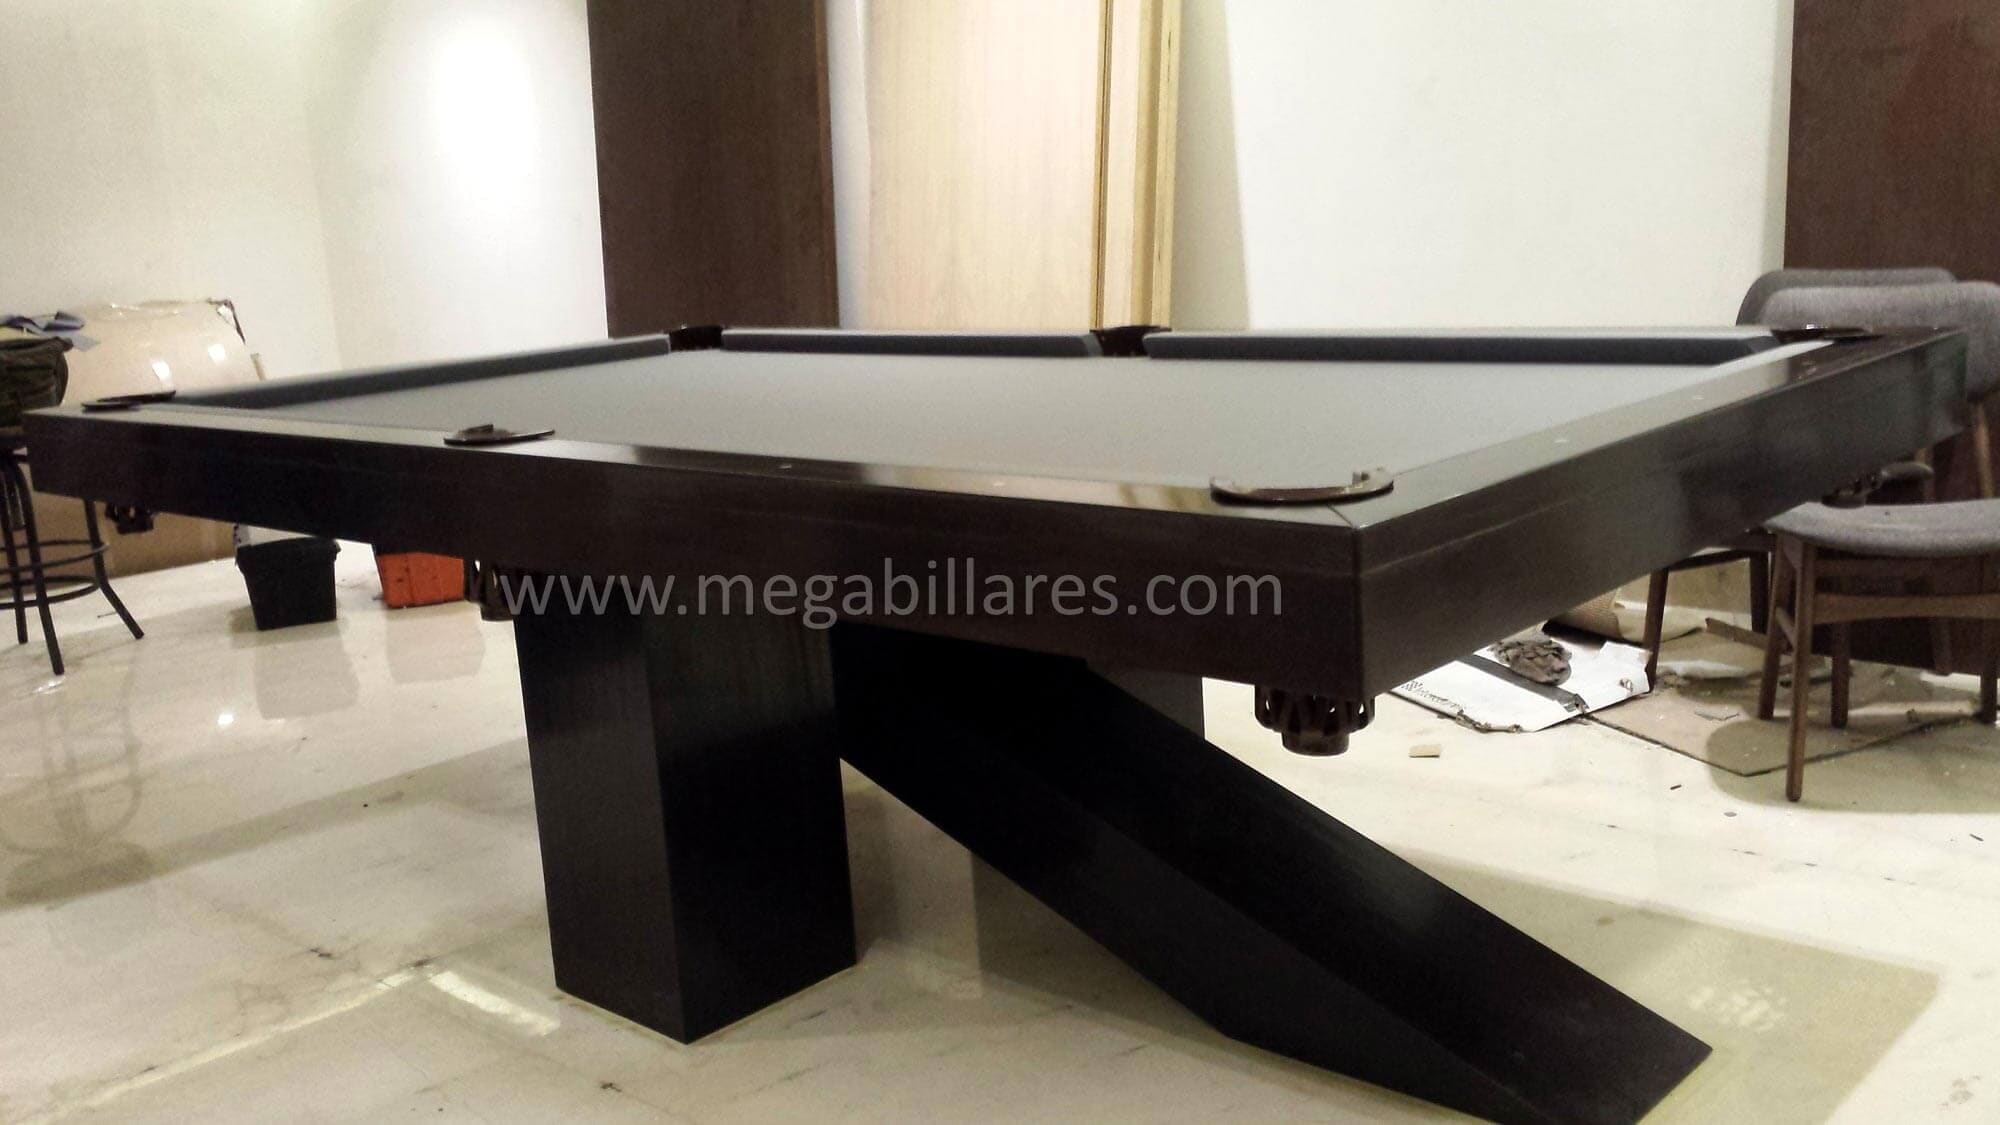 MEGABILLARES - MESAS DE BILLAR CONVERTIBLES